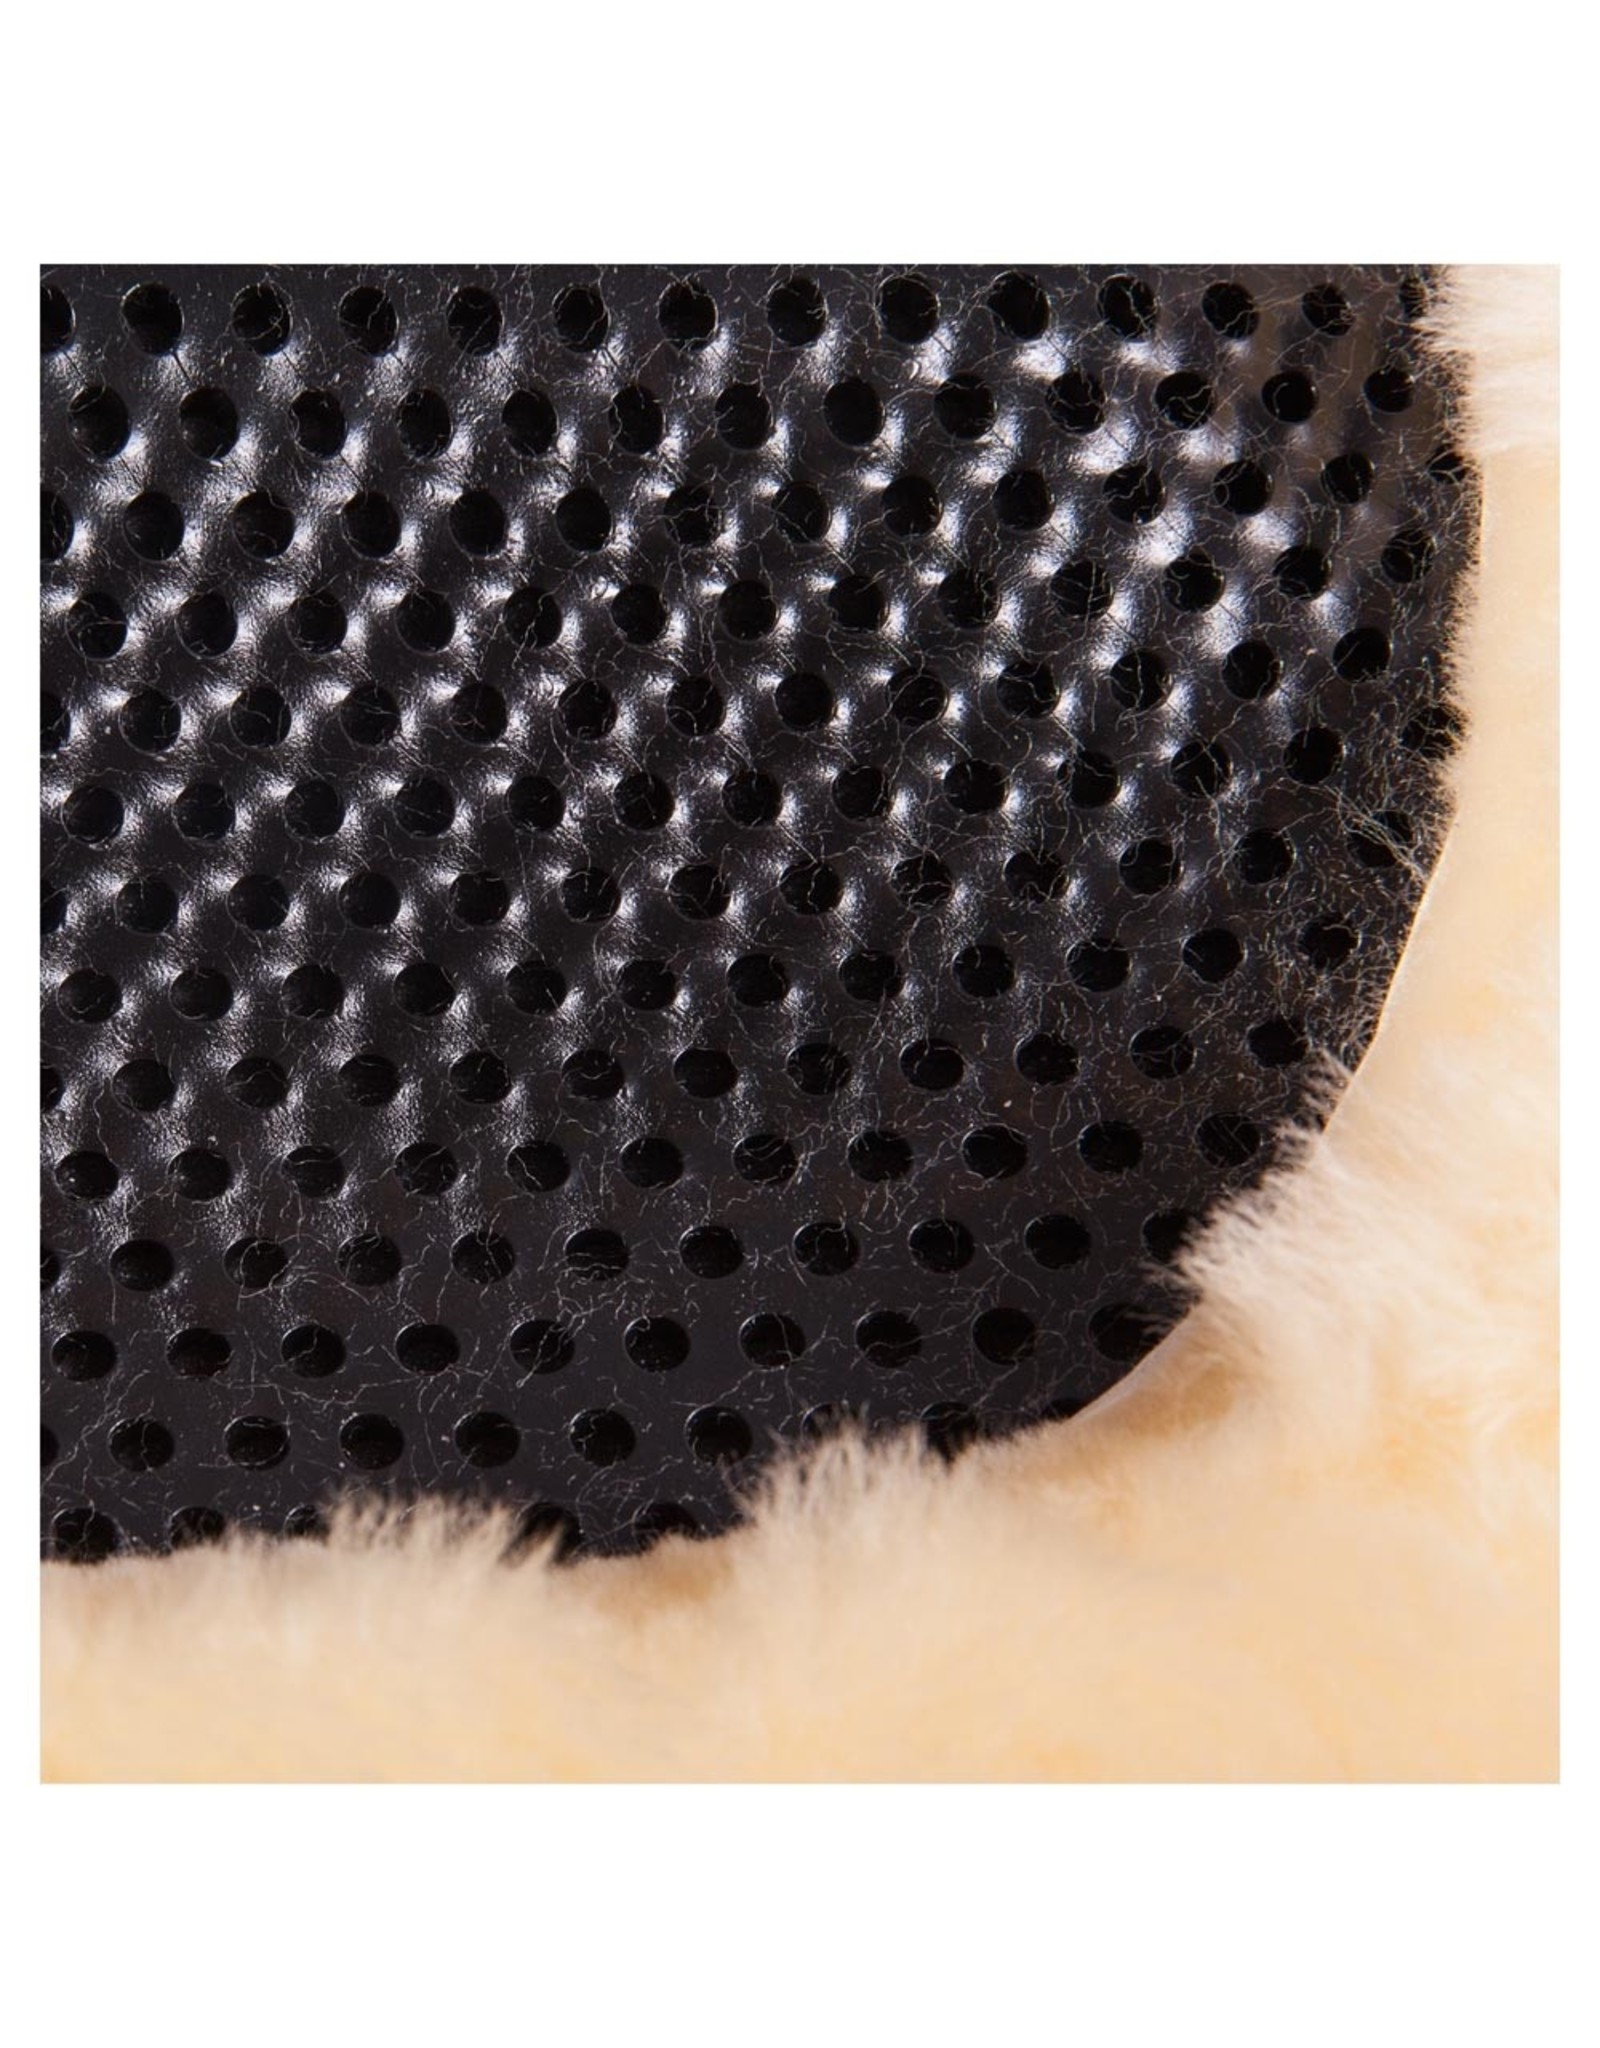 BR BR Gel pad therapeutic soft dri-lex schapenvacht Zwart L